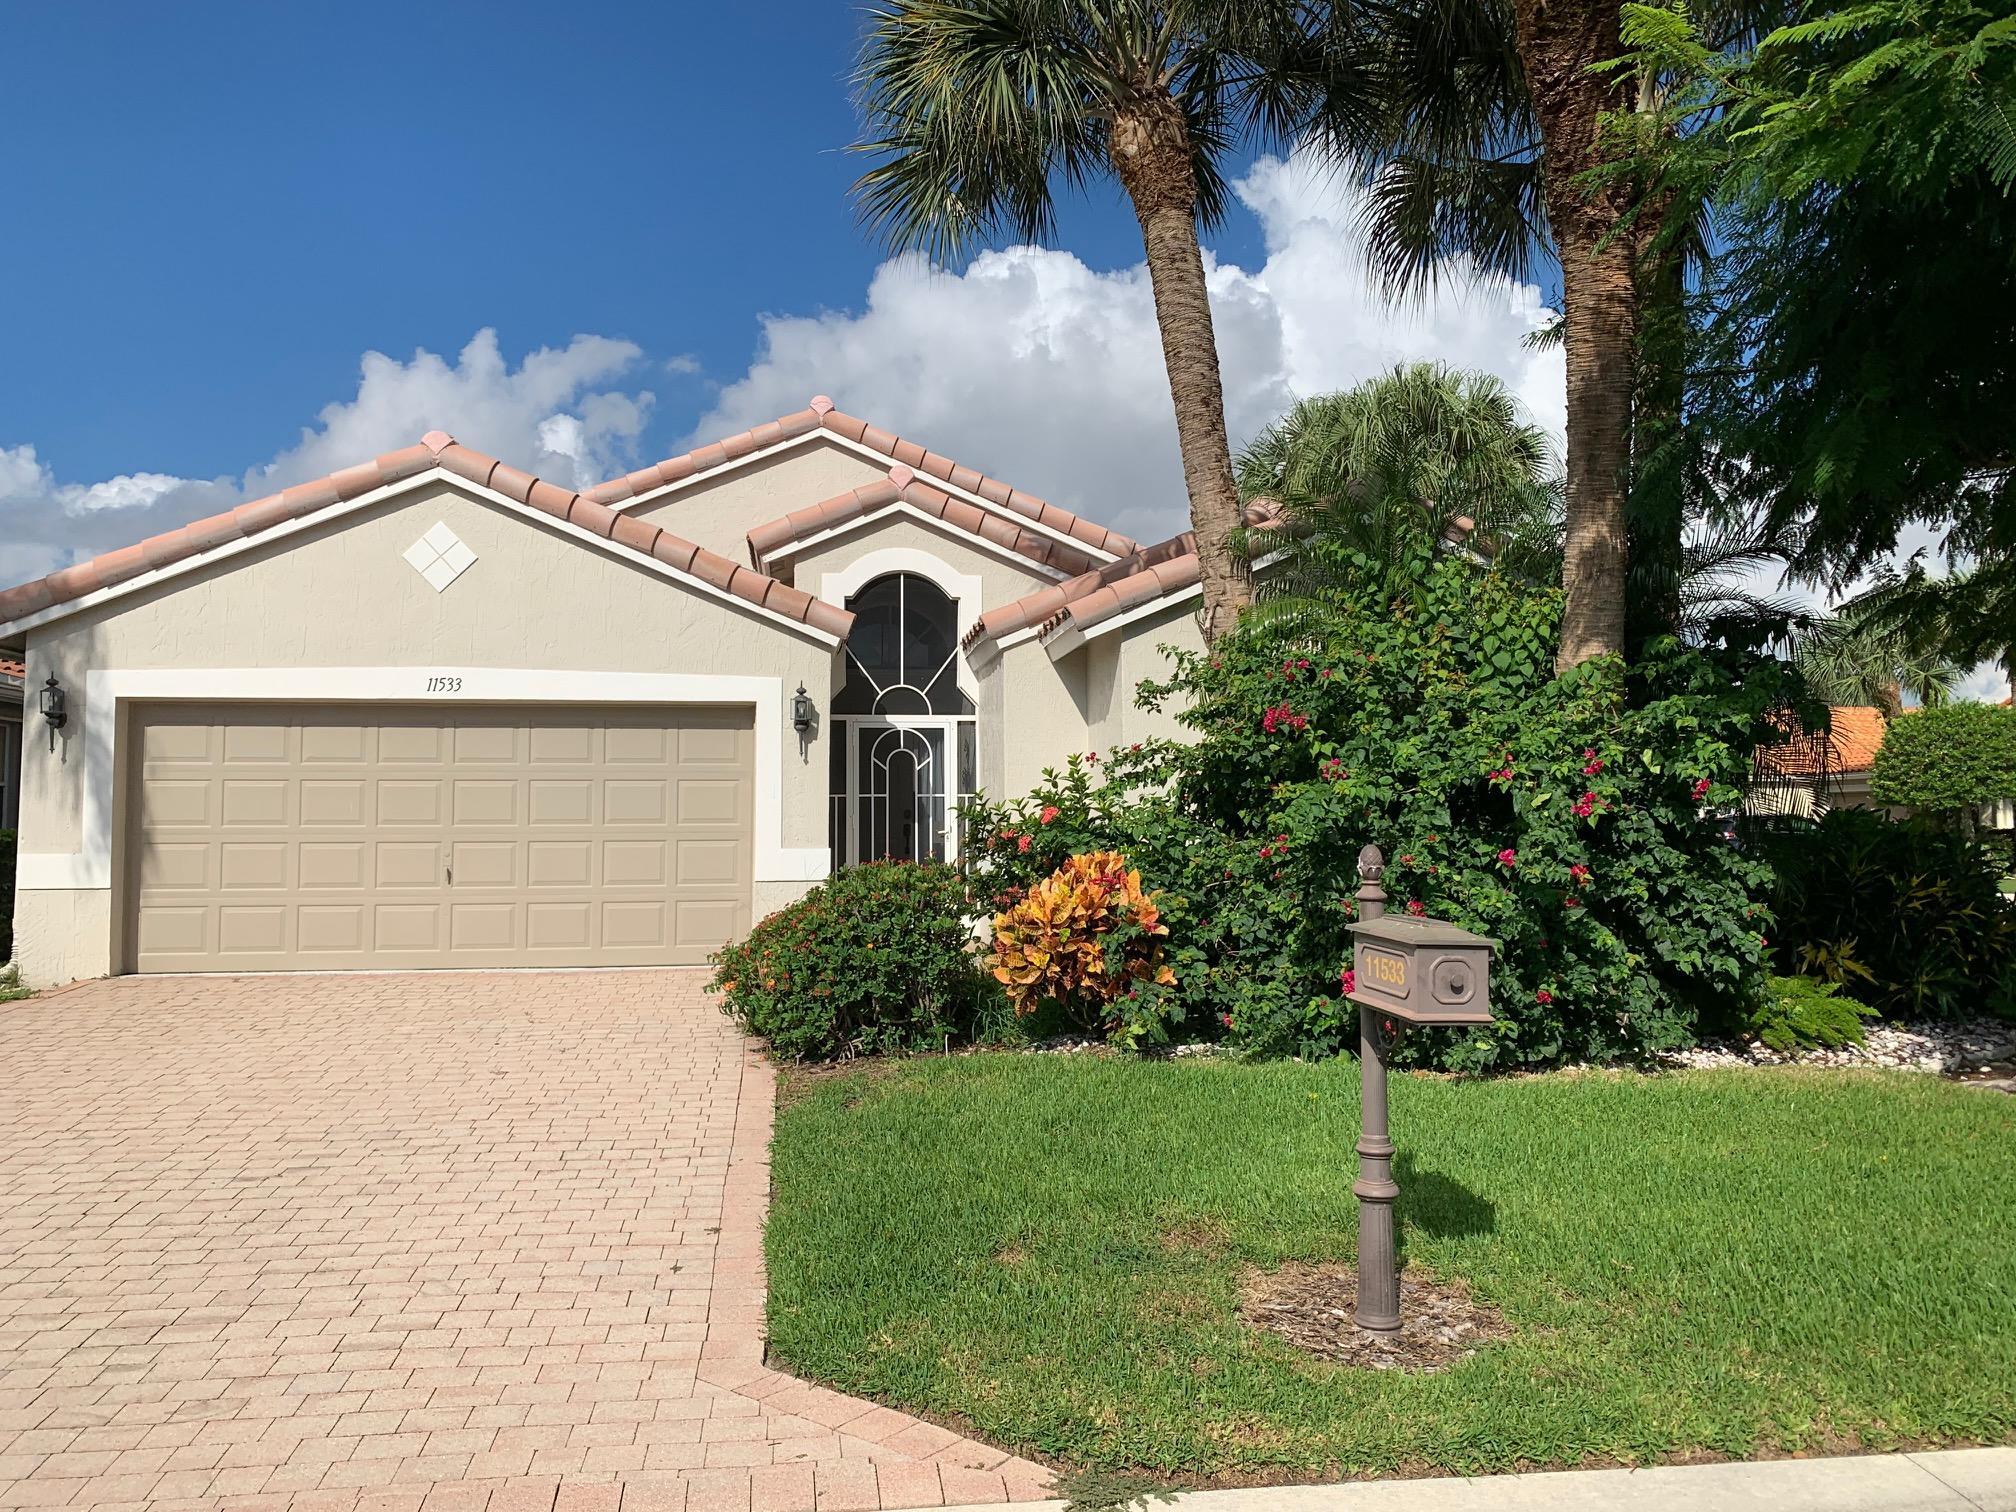 11533 Alana Terrace Boynton Beach, FL 33437